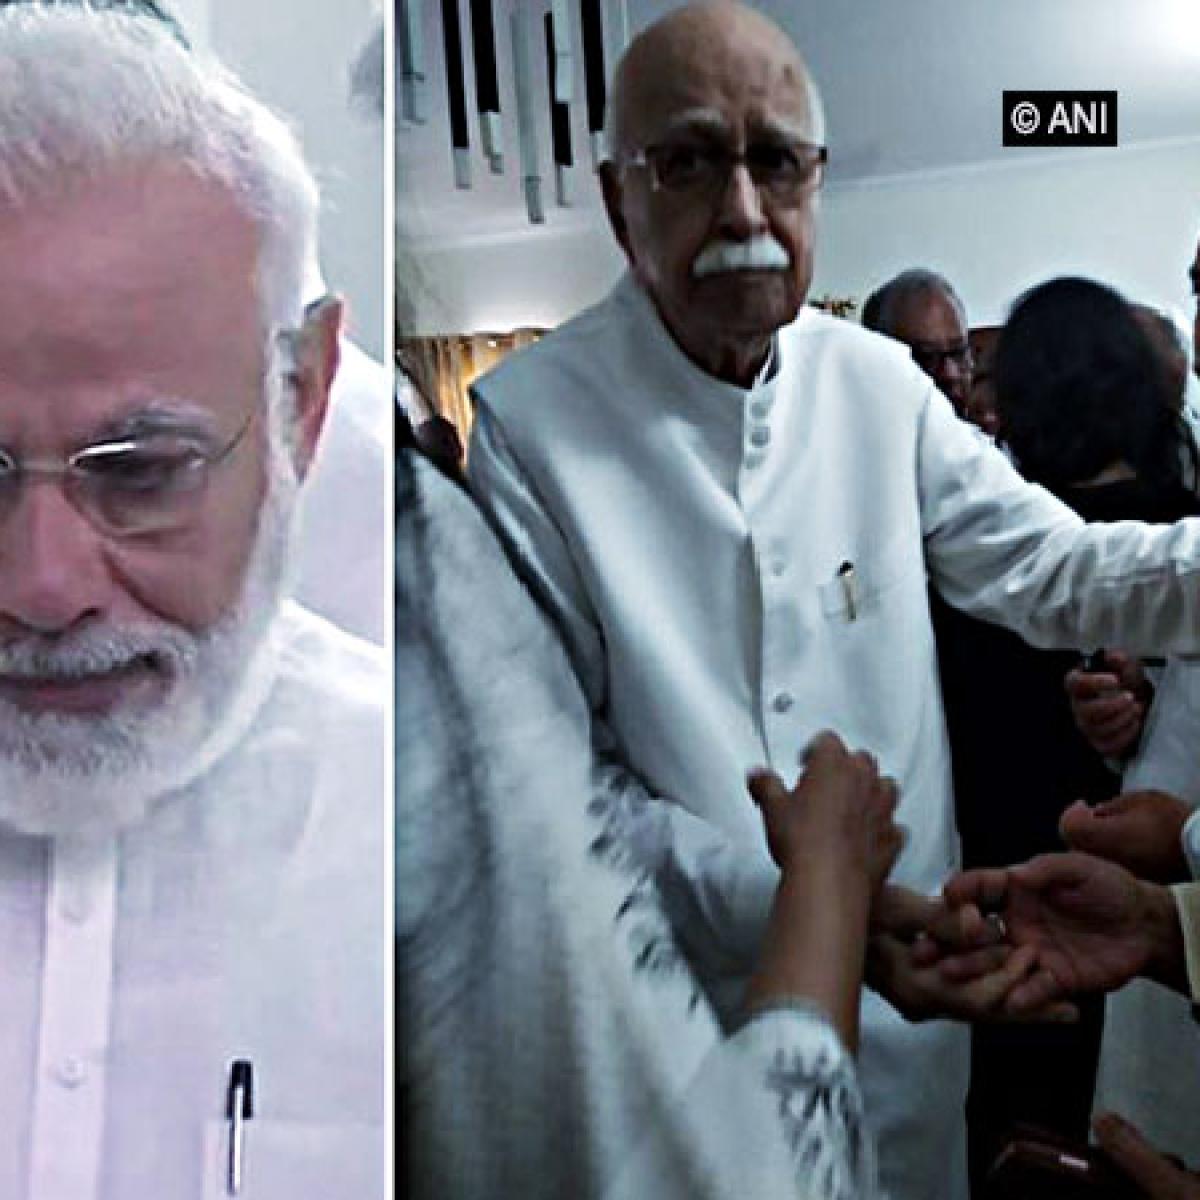 PM Modi, LK Advani turn emotional as they pay last respect to Sushma Swaraj